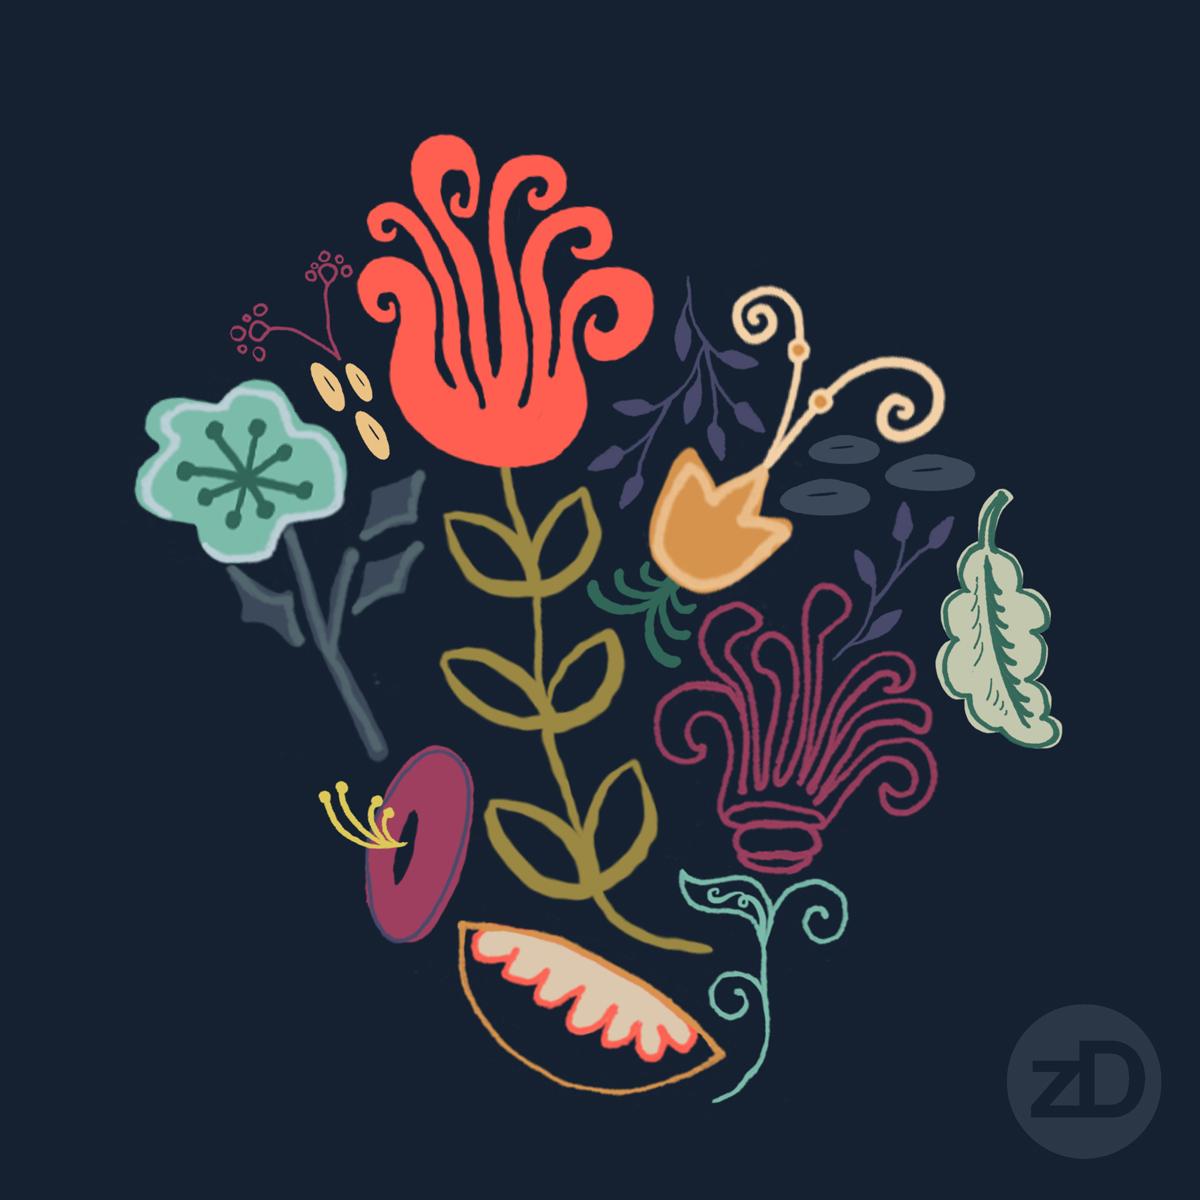 Zirkus Design   New Navy Vintage Floral Pattern - Design Process: Initial Repeat Pattern Motif Grouping